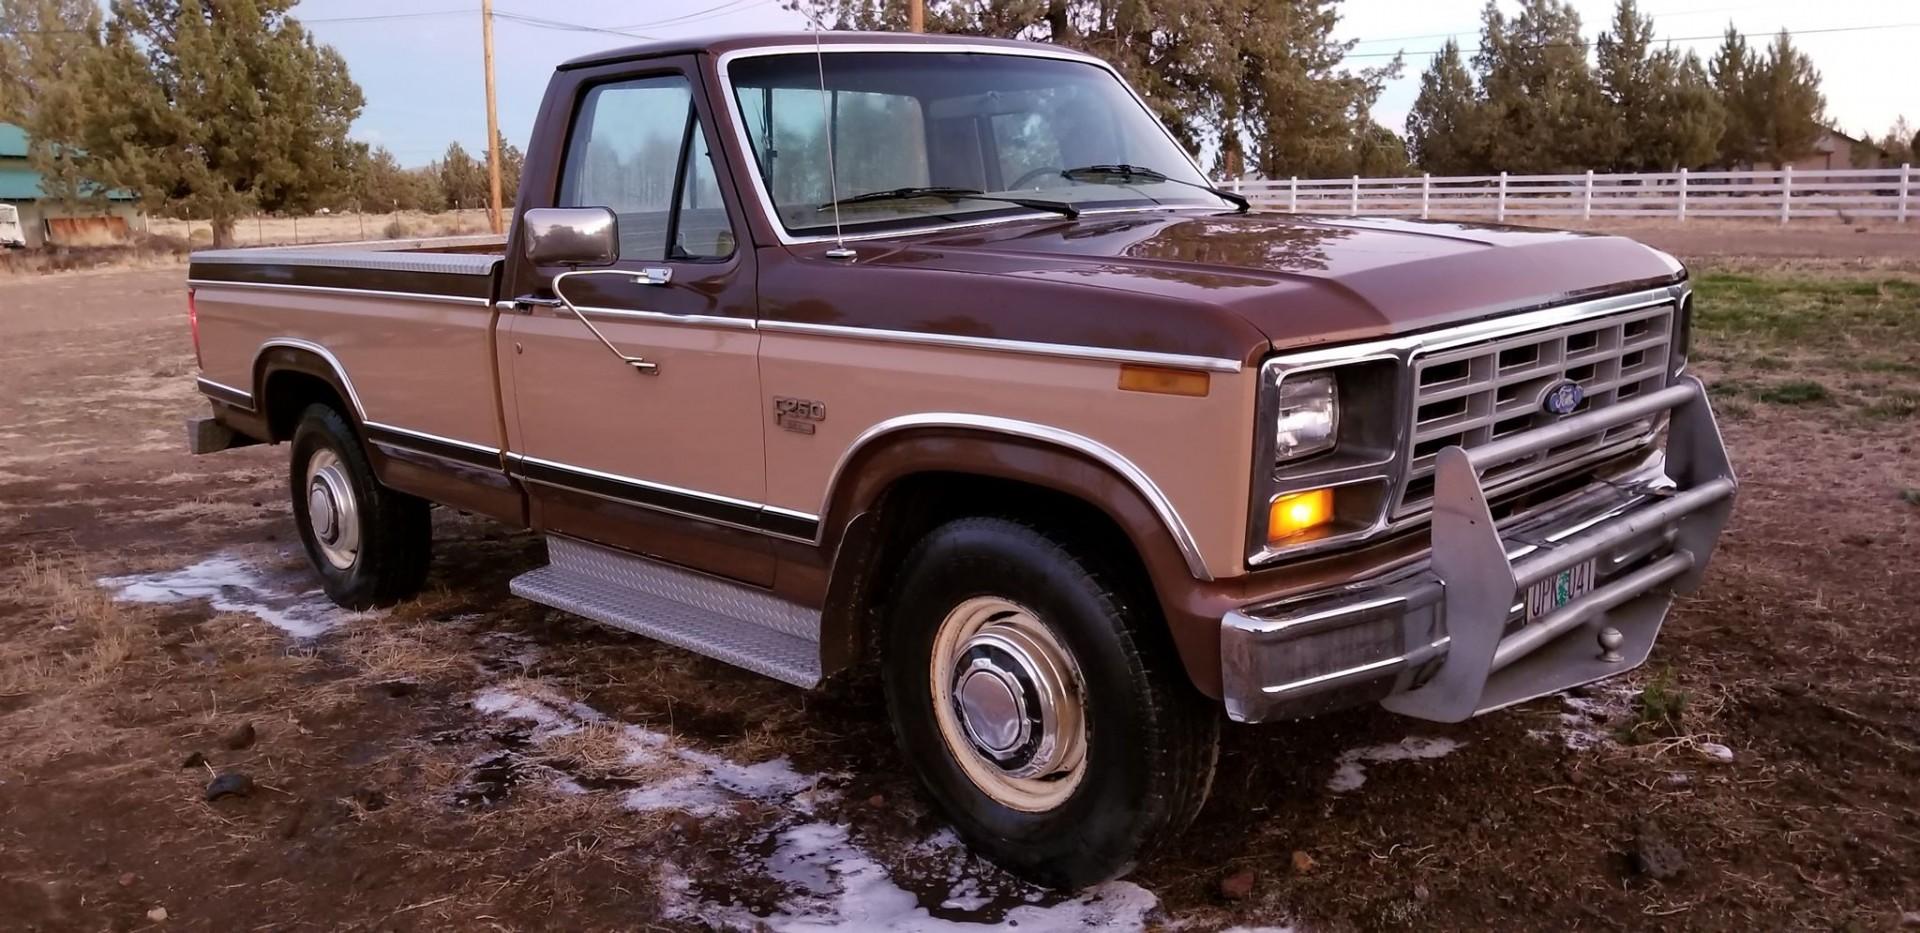 1983 Ford F250 351ci - C6 (2)